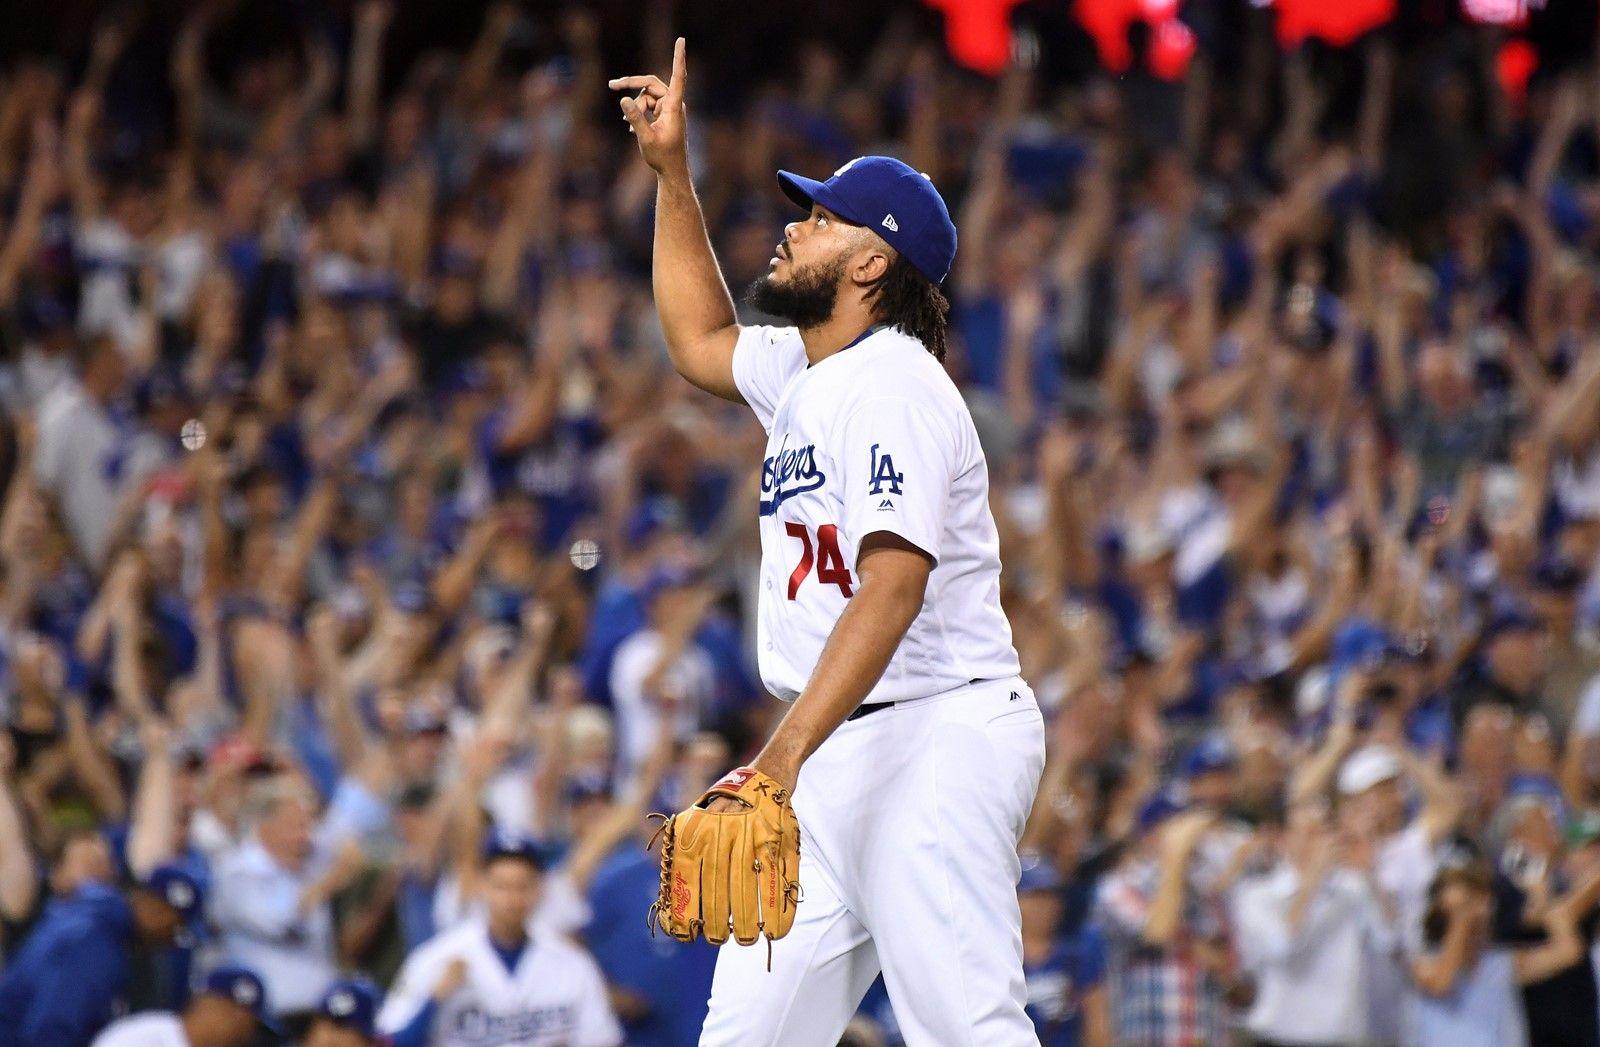 Los Angeles Times Dodgers baseball, Dodgers, La dodgers